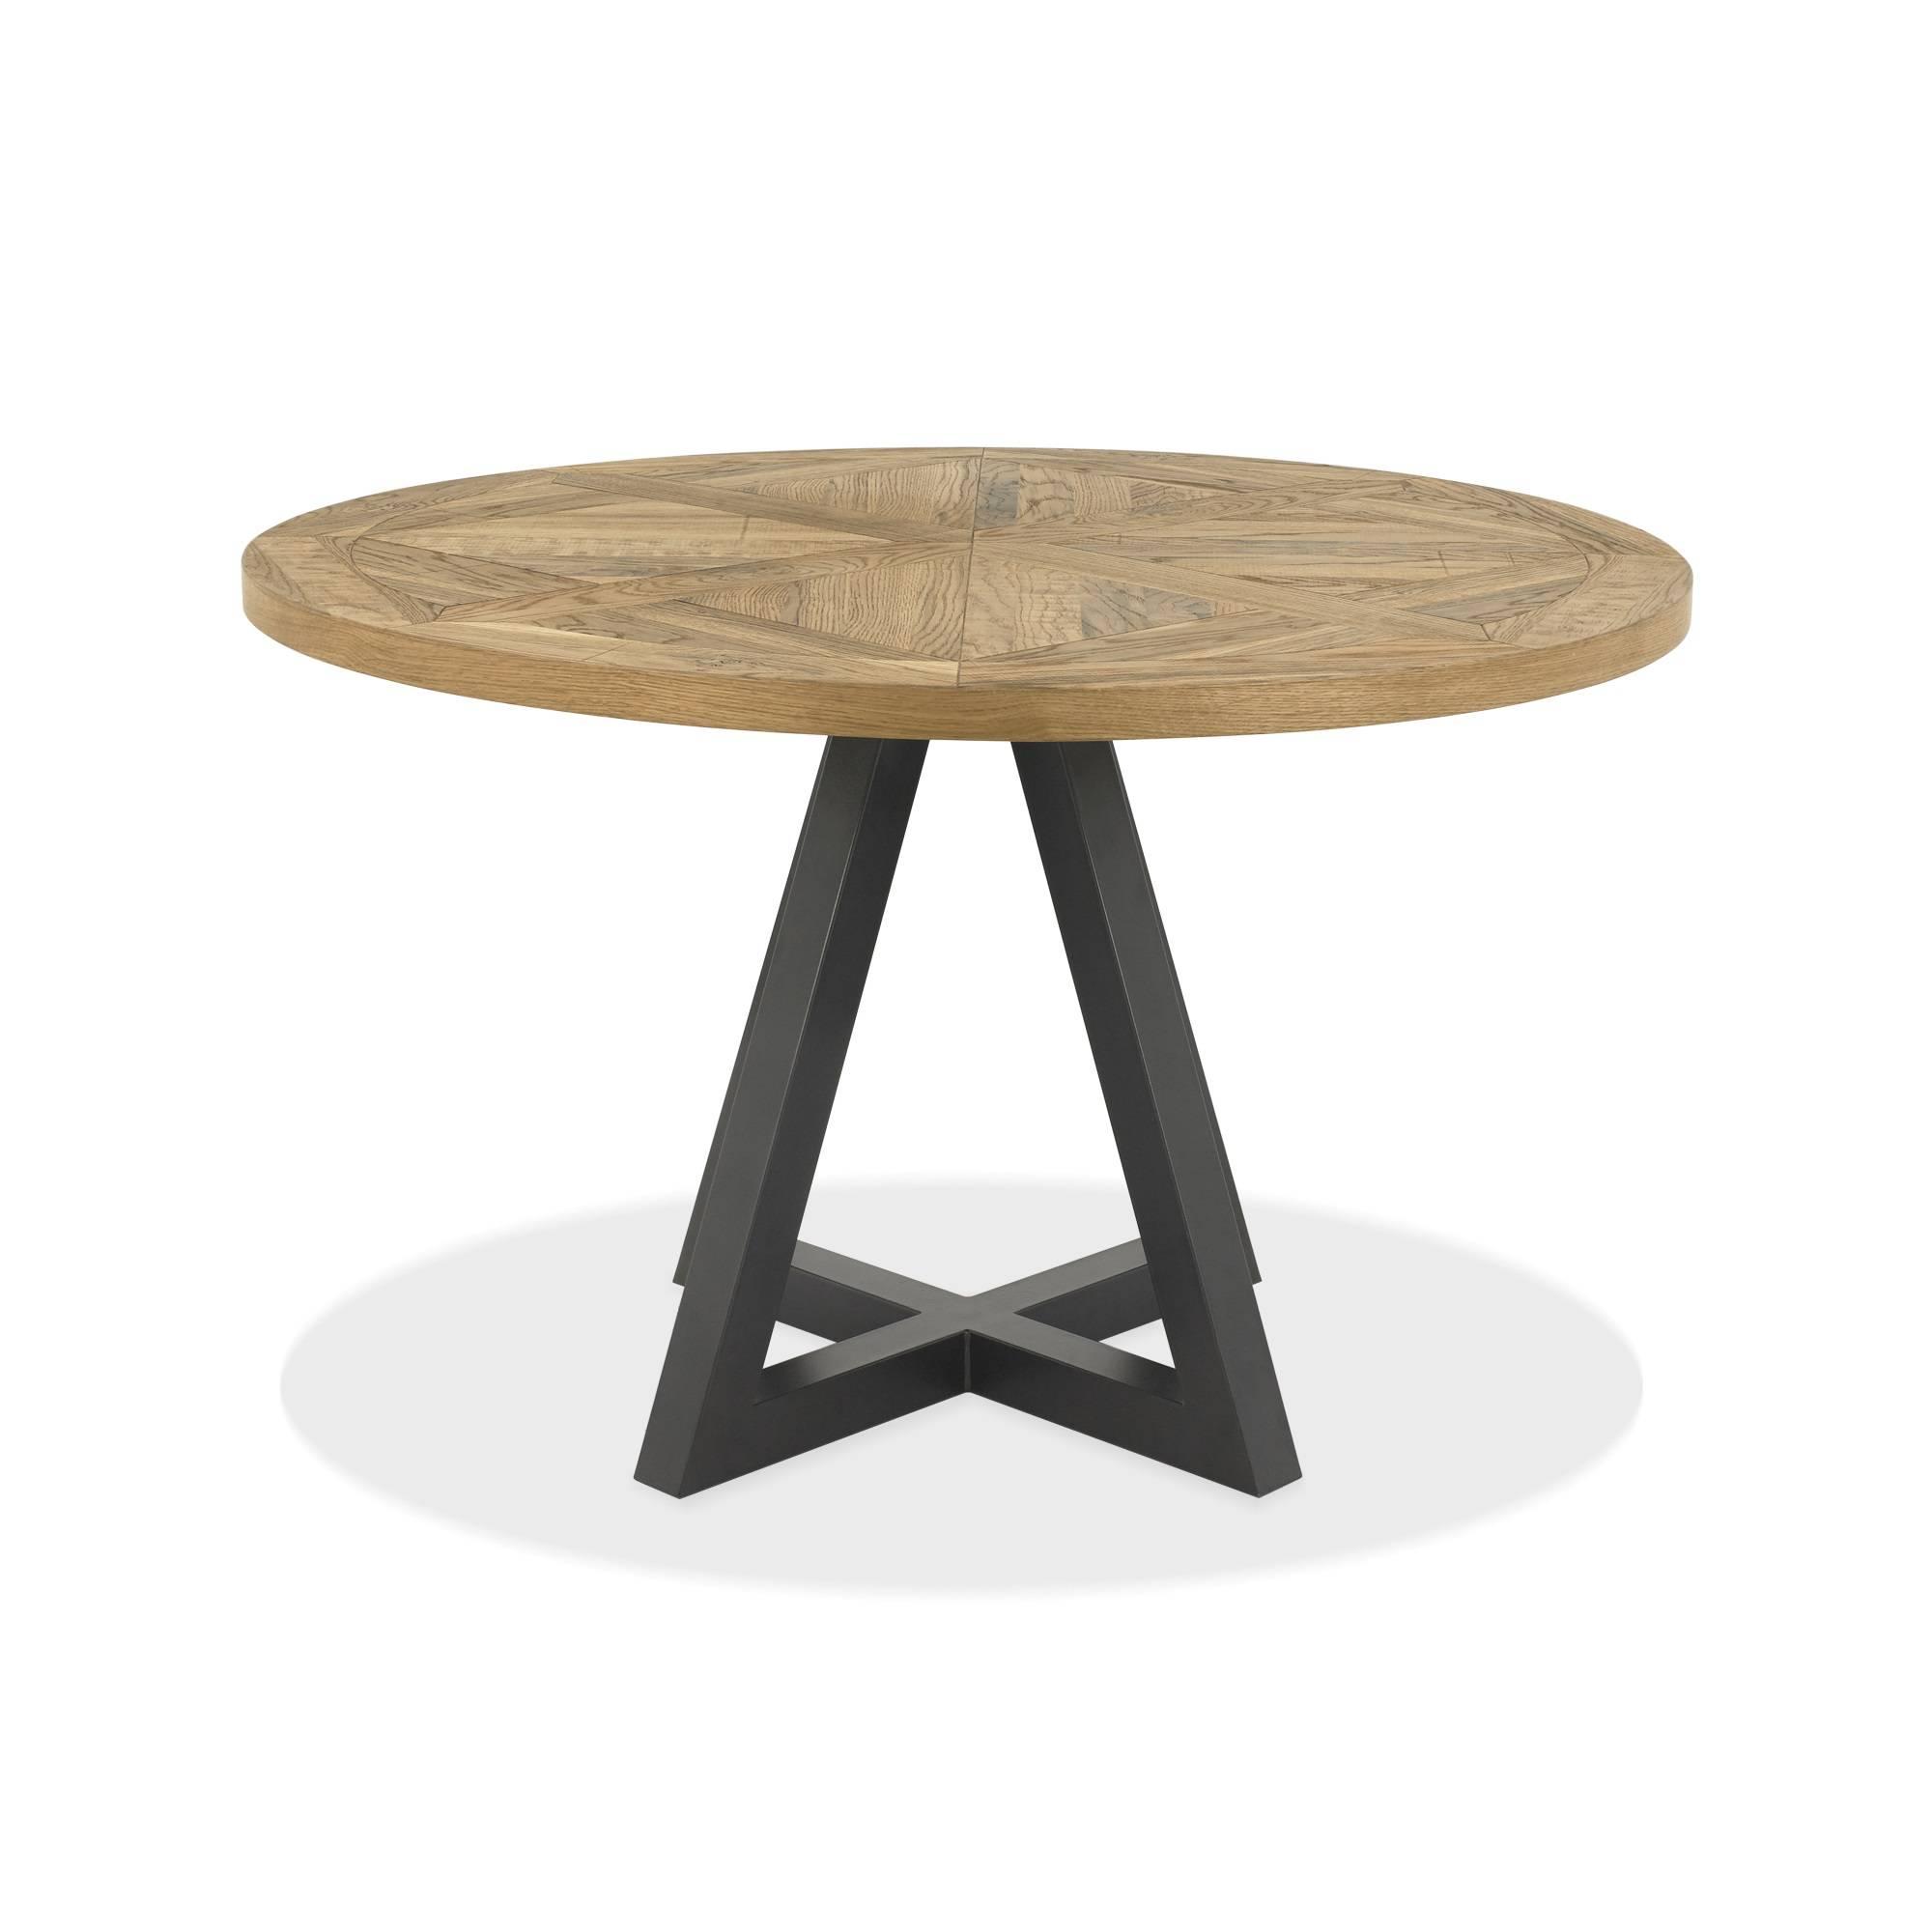 Vancouver Rustic Oak Circular Dining Table : Oldrids & Downt